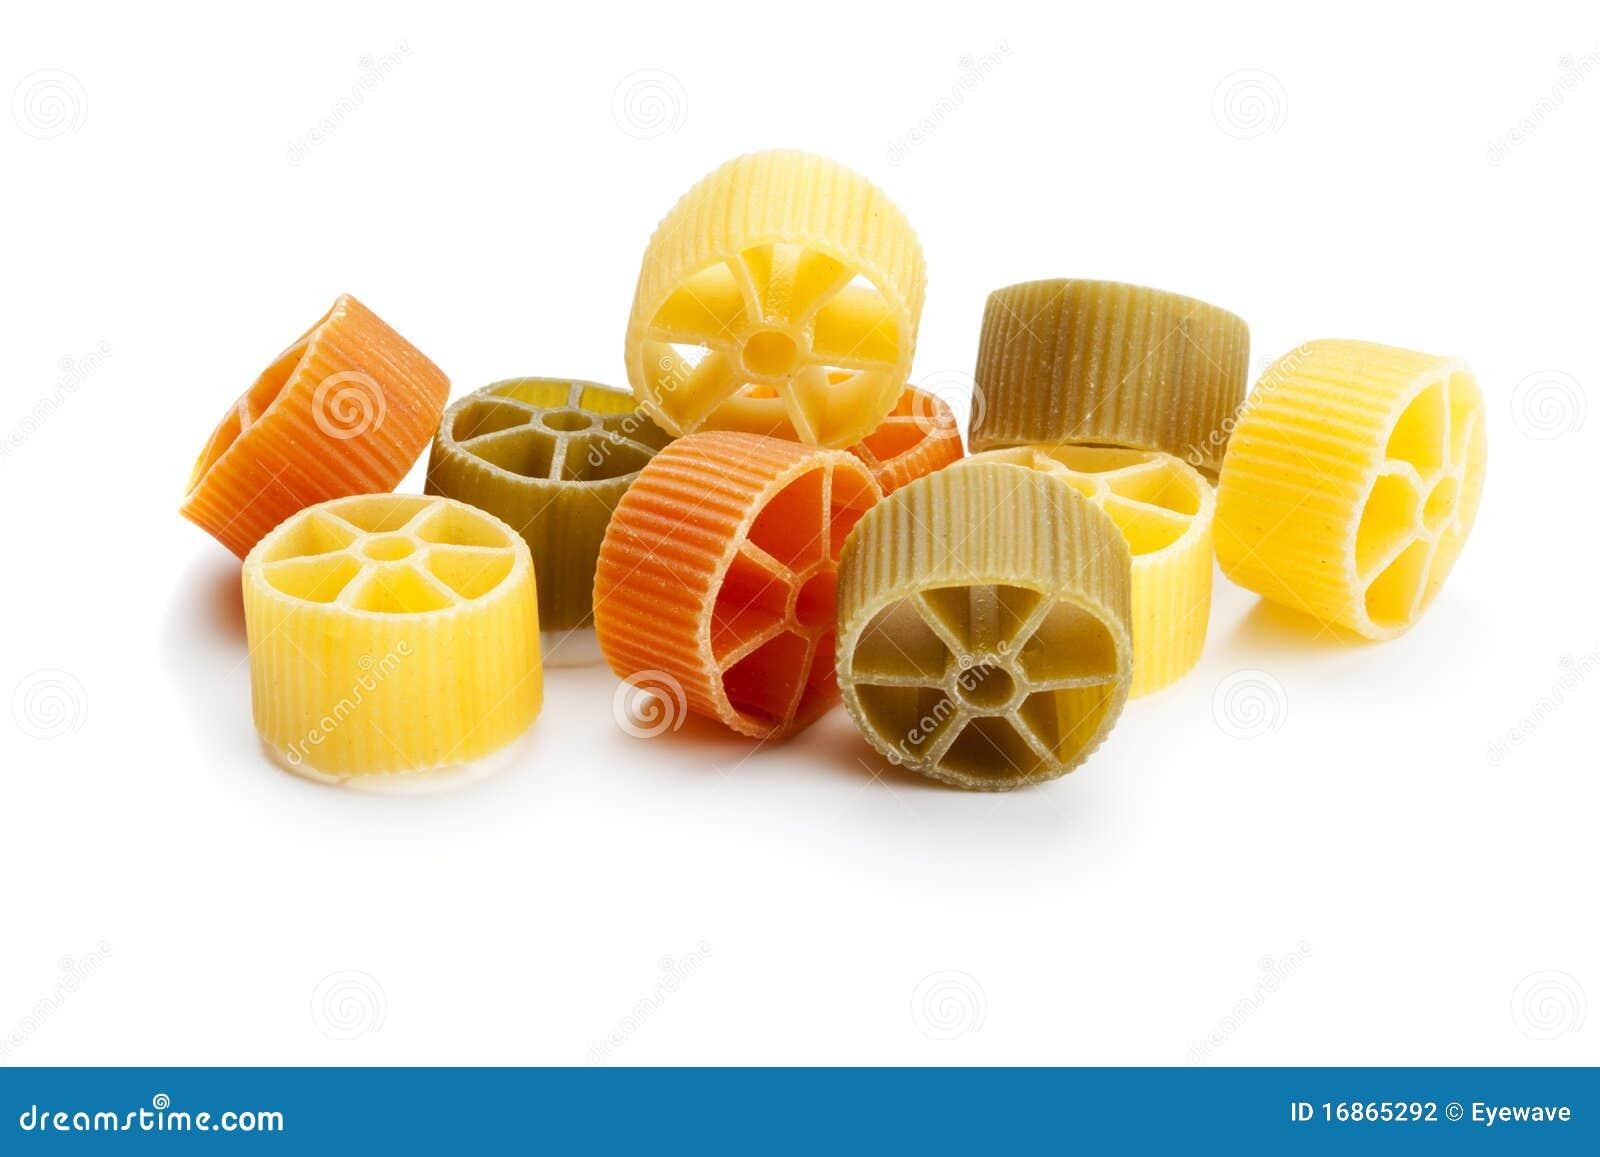 Pasta Border Ruote-pasta-isolated-16865292.jpg